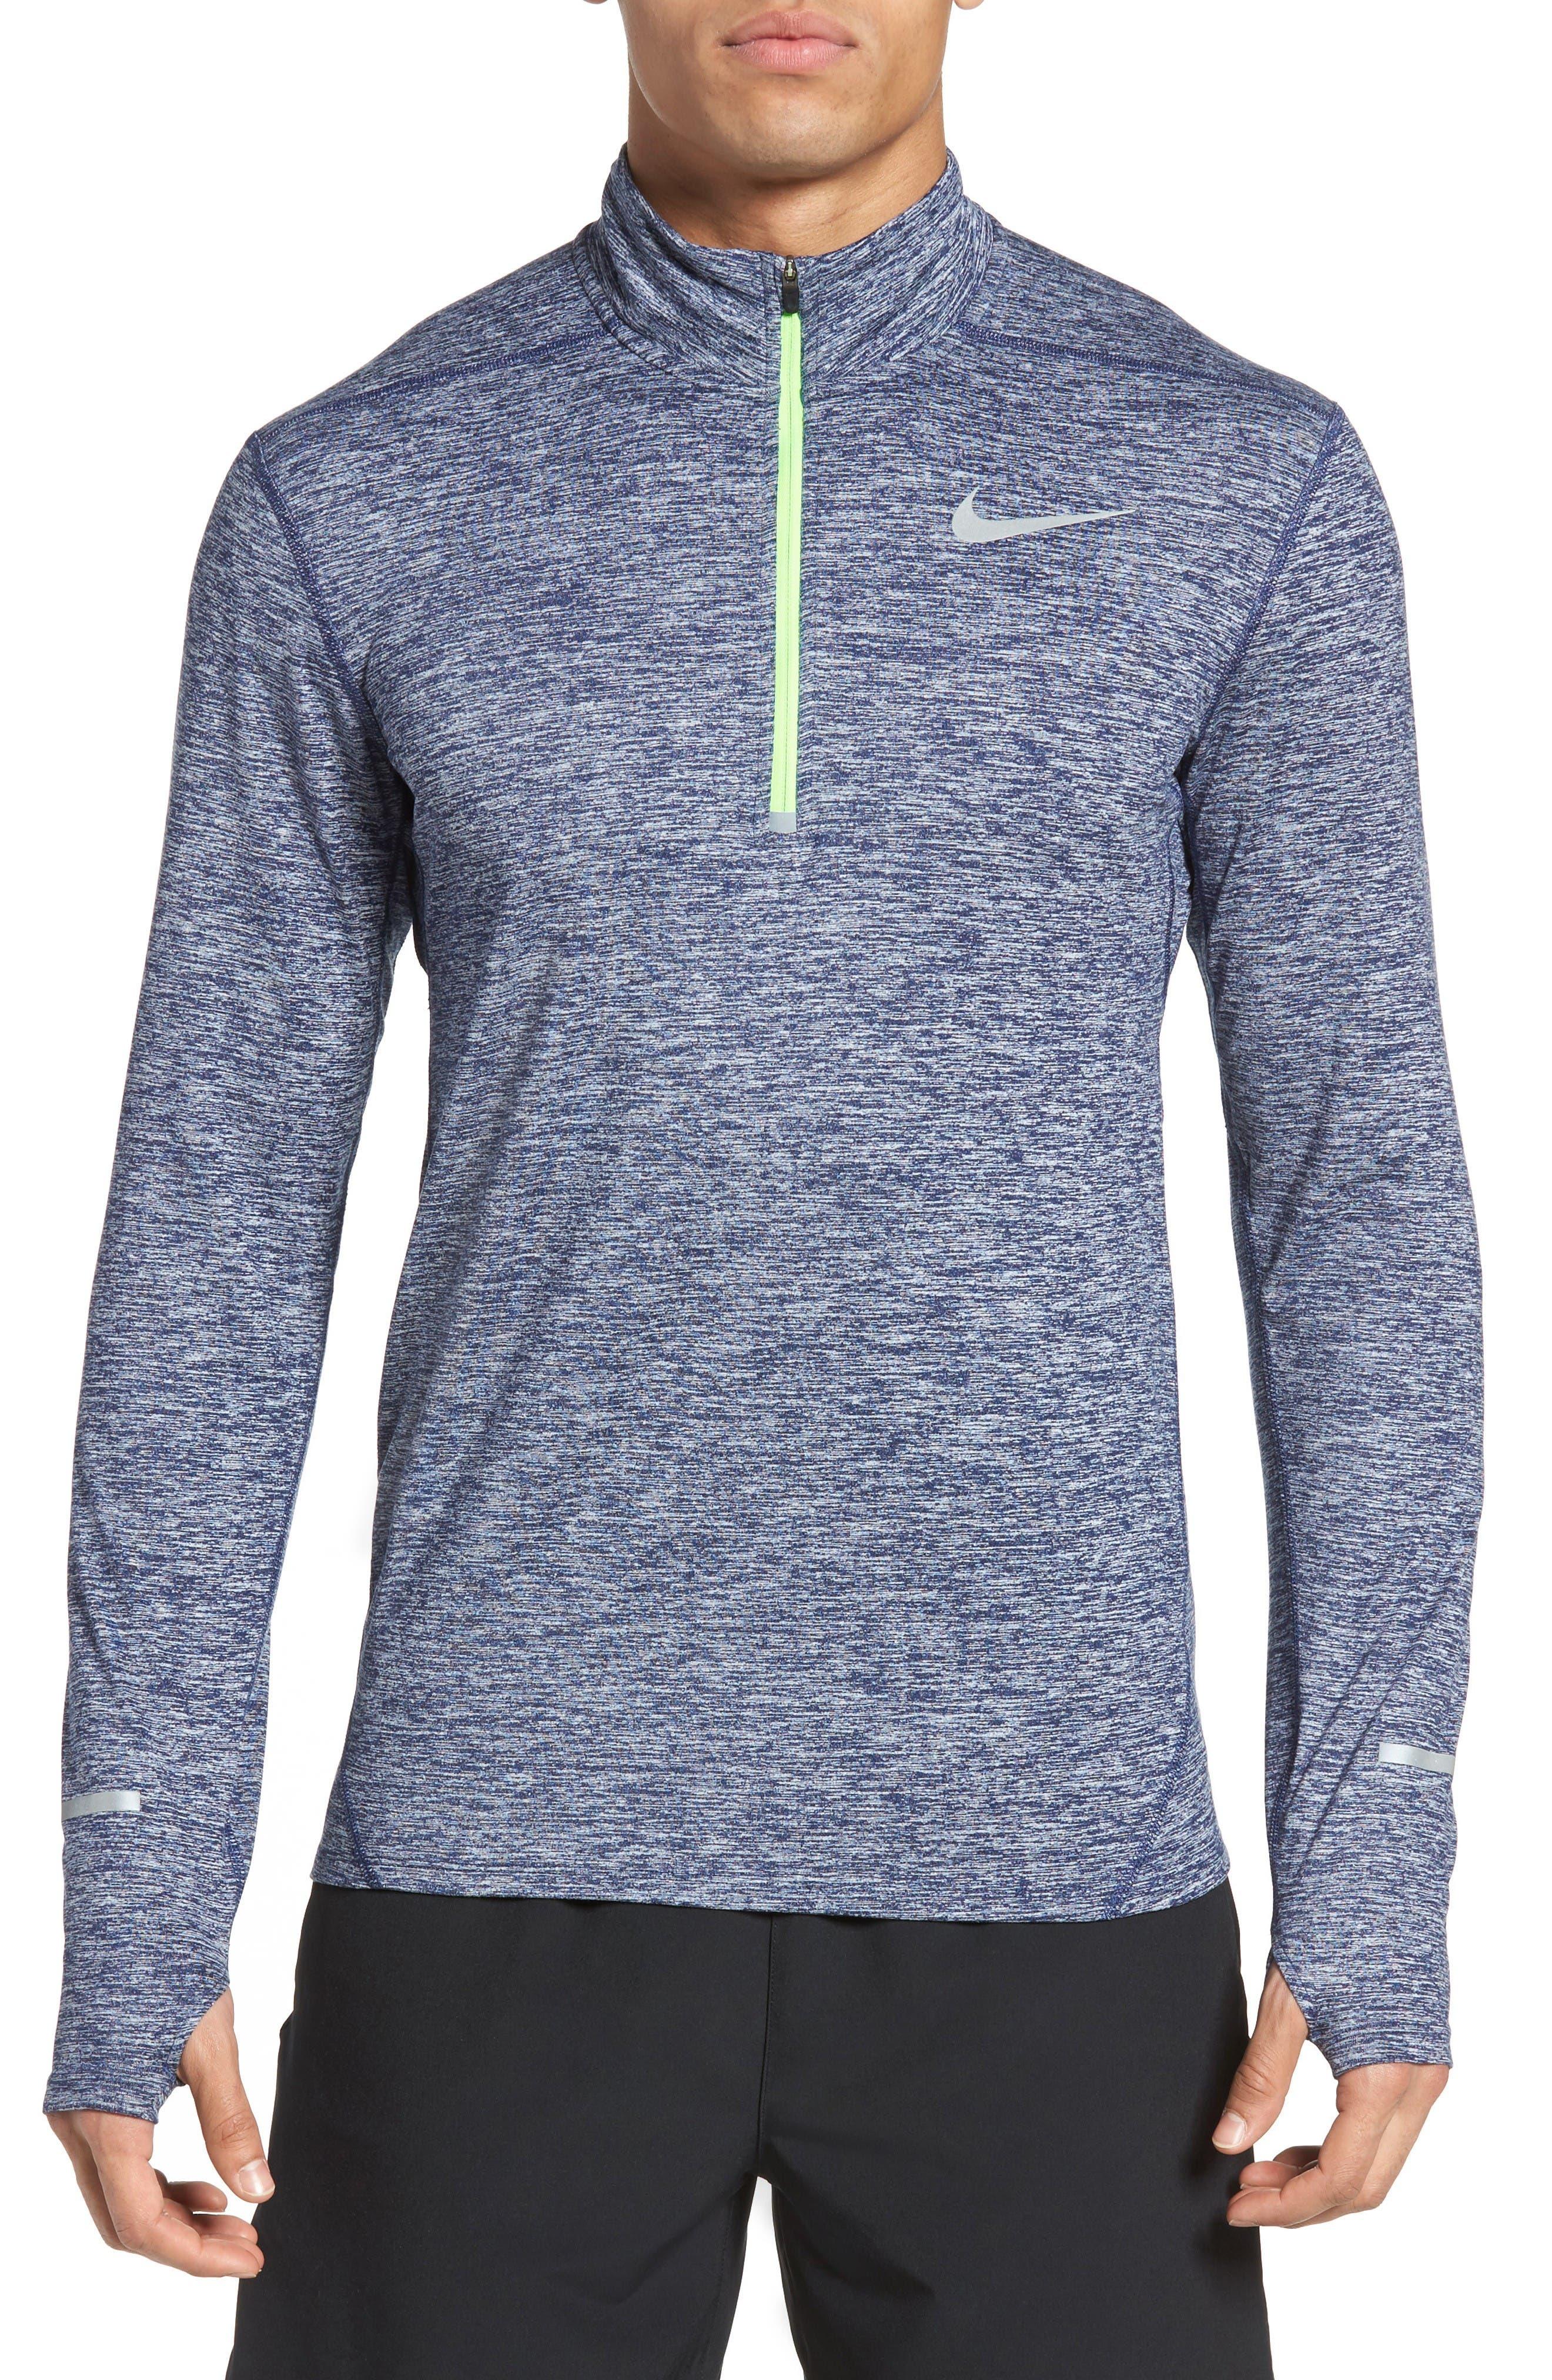 Main Image - Nike 'Element' Dri-FIT Quarter Zip Running Top